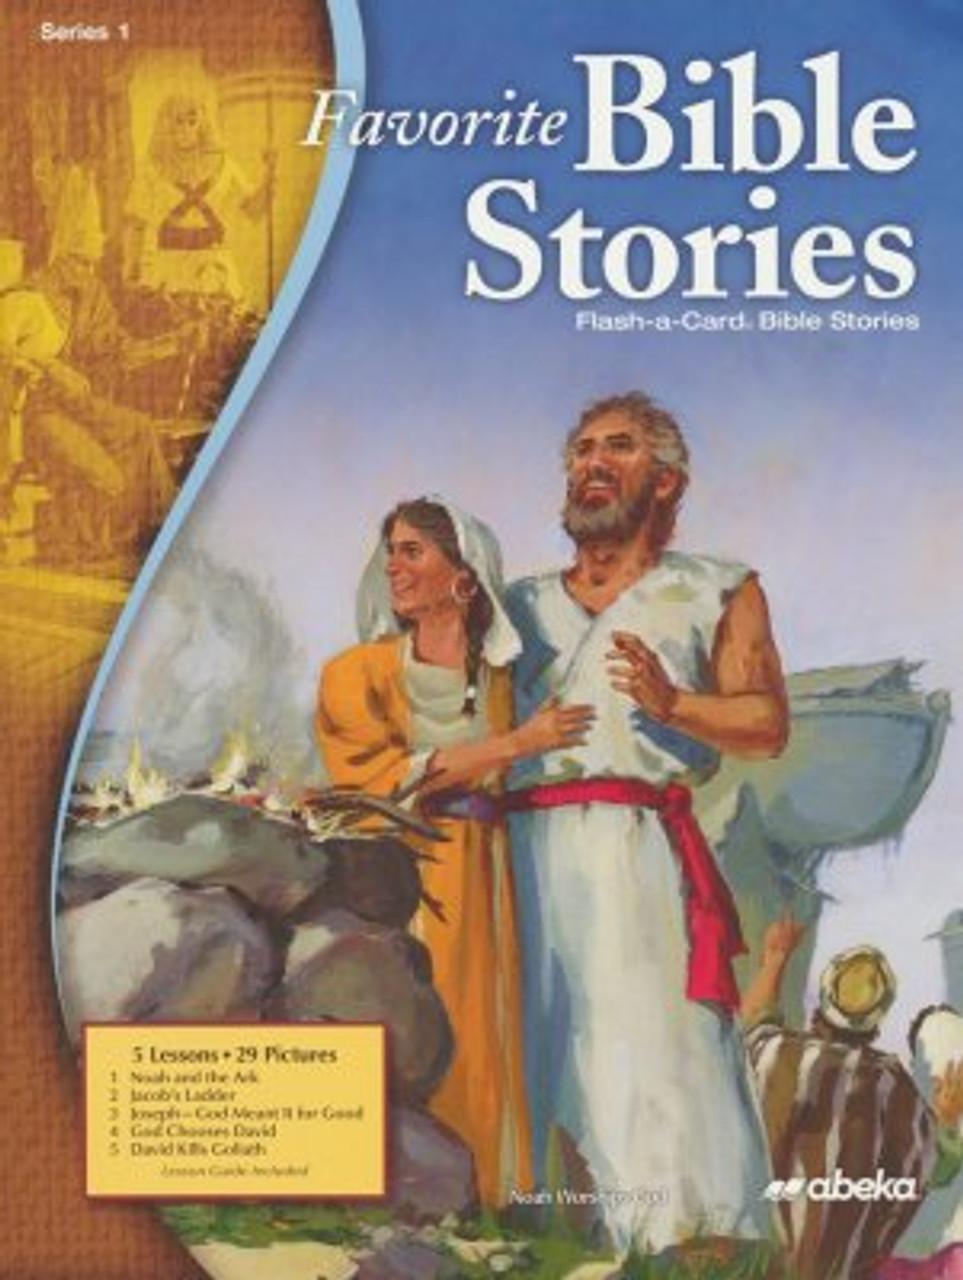 Favorite Bible Stories 1 (12x16)